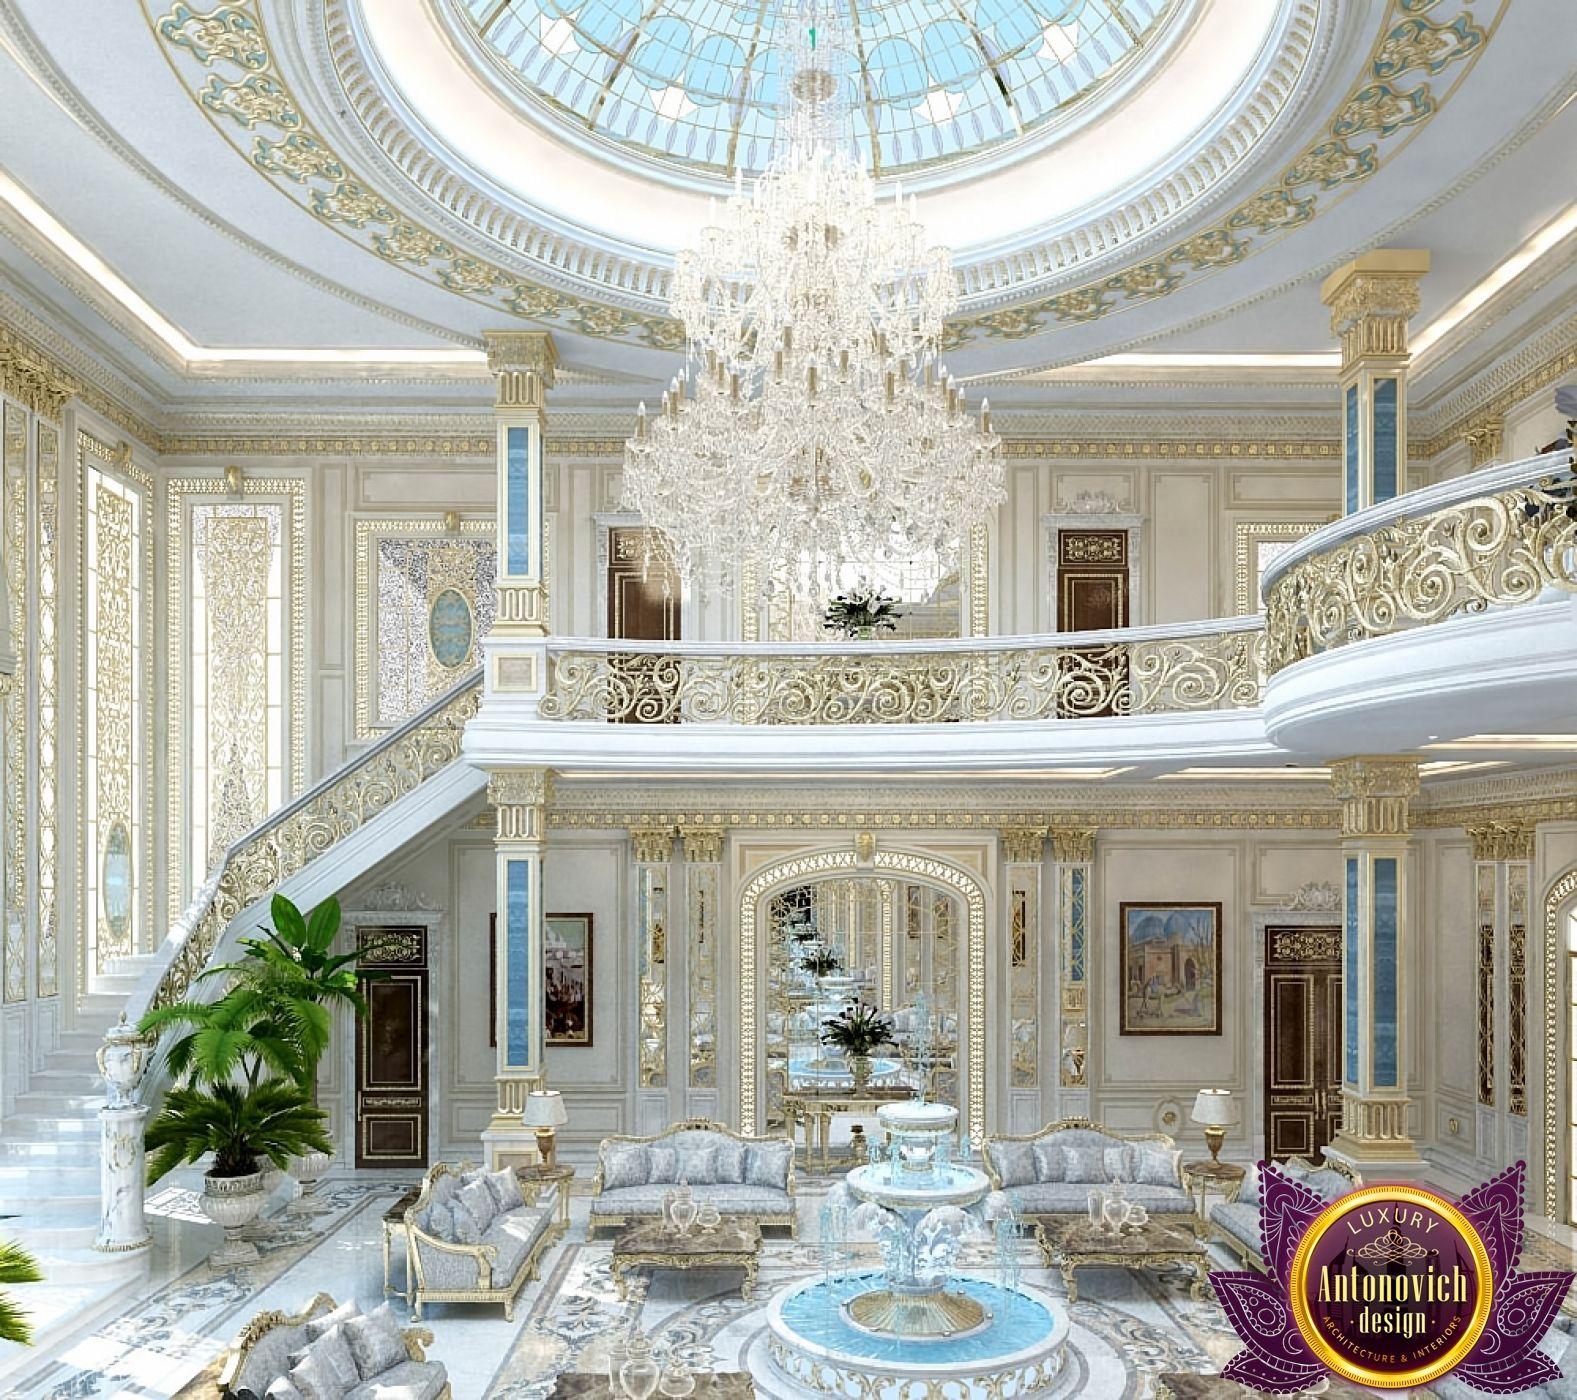 Living Room Designs In Dubai entrance design in dubai, luxury royal main entrance design, photo